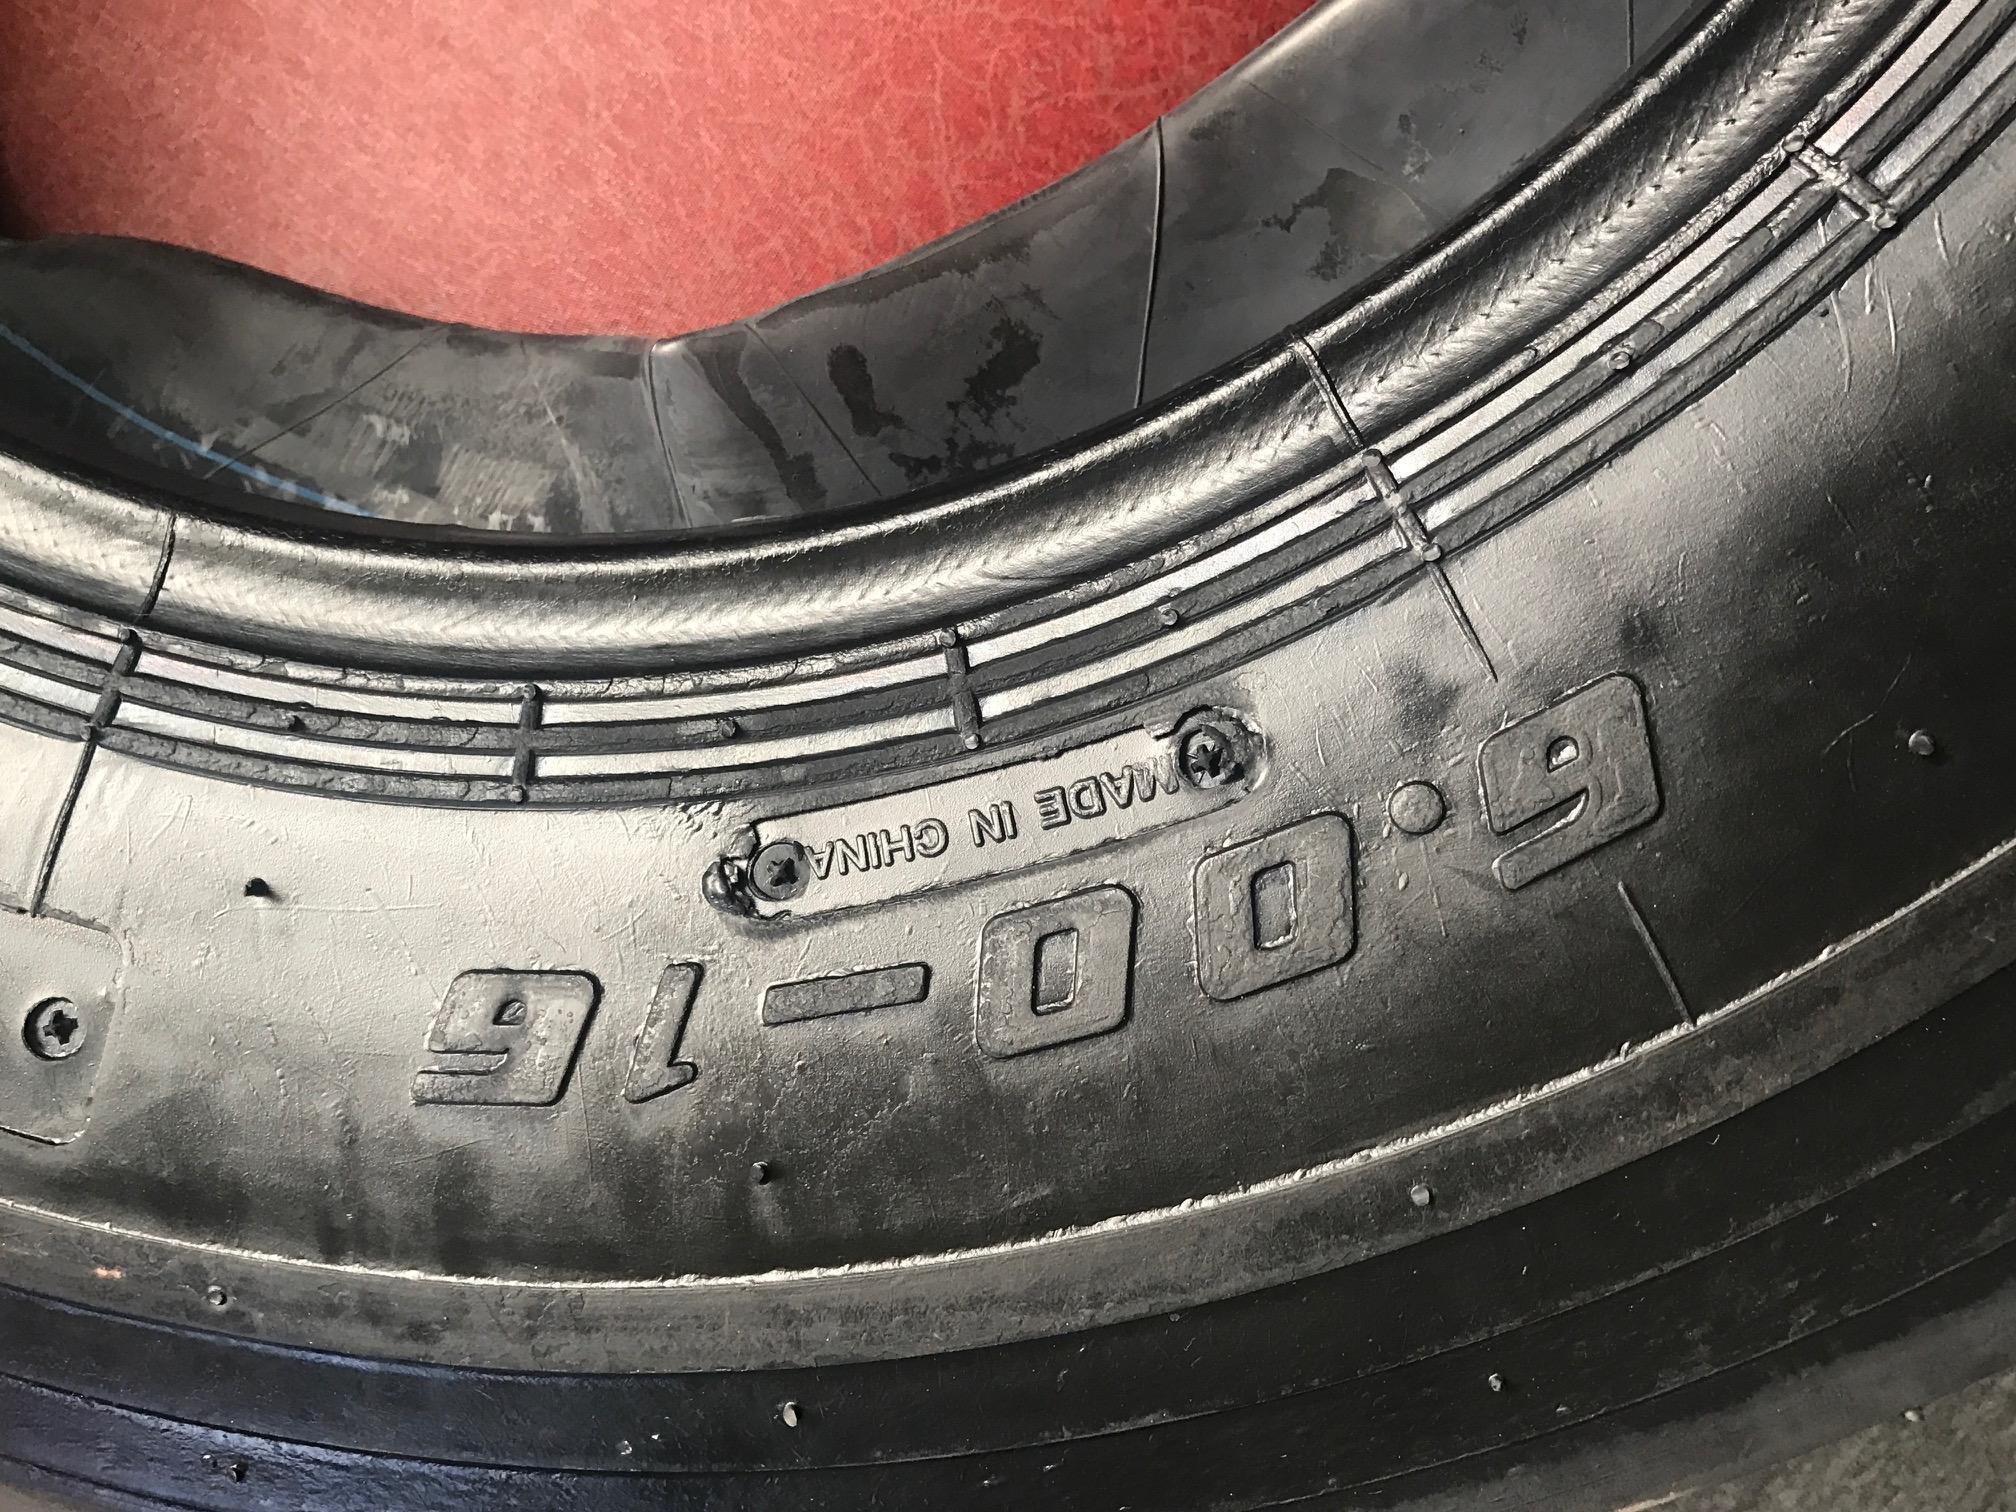 (2 TIRES NO TUBE ) 6.00-16 6PLY F2 3-Rib Farm Tractor Tires by UNILLI (Image #2)